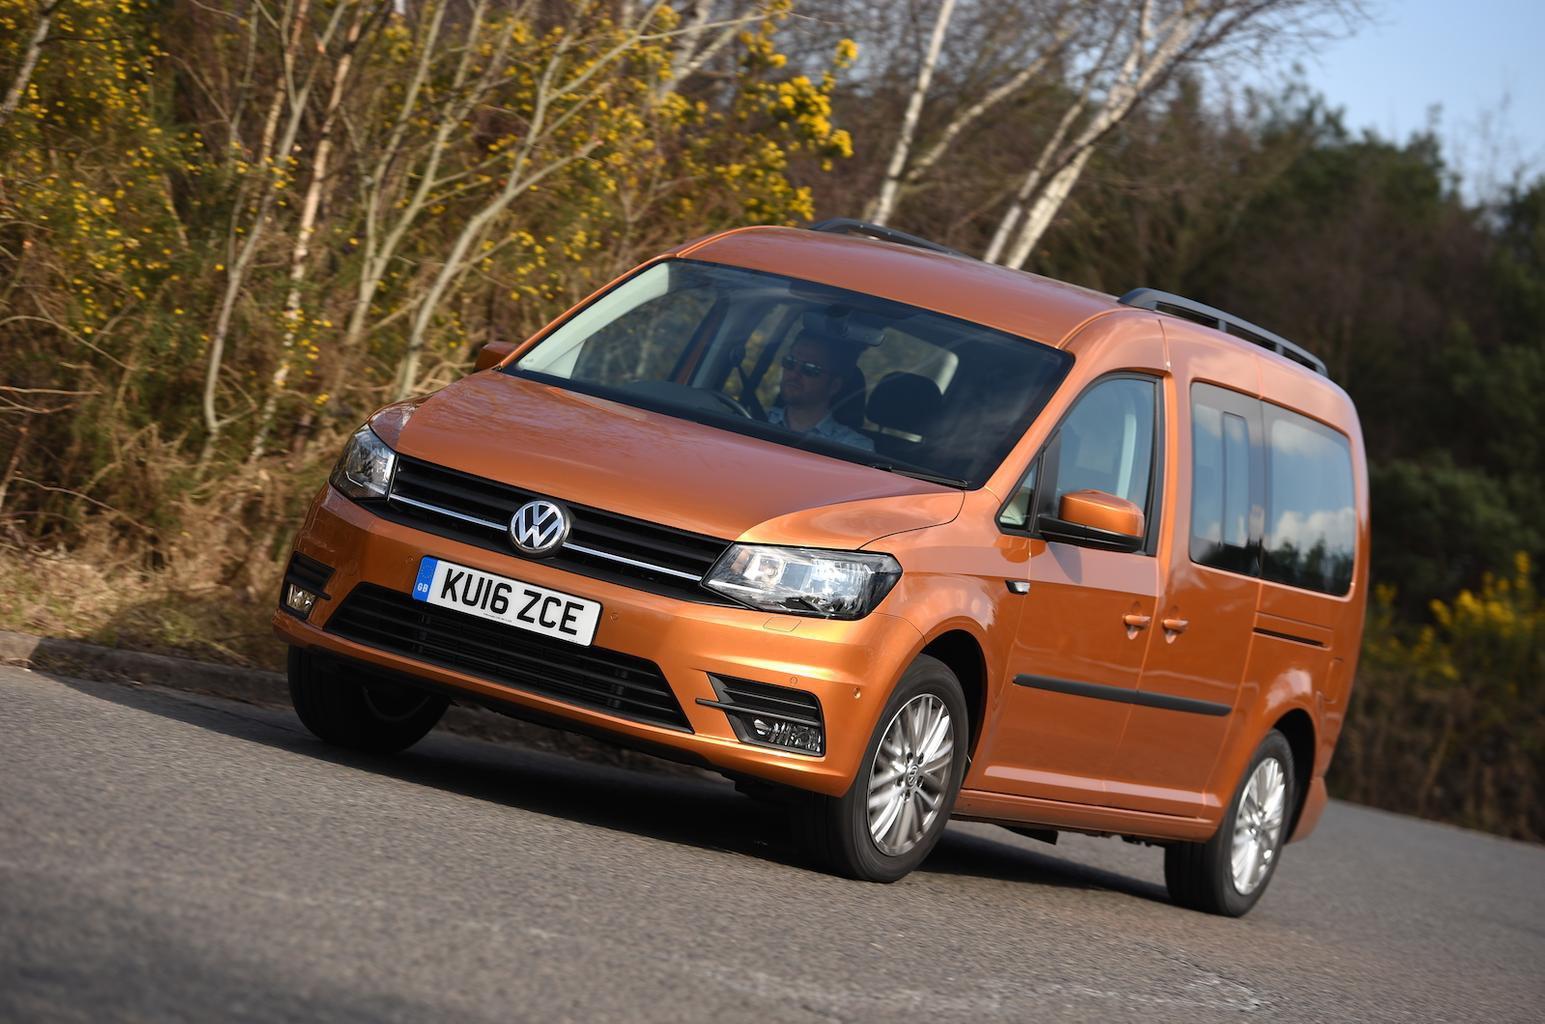 1a6dd0095c 2016 Volkswagen Caddy Maxi Life 1.4 TSI review